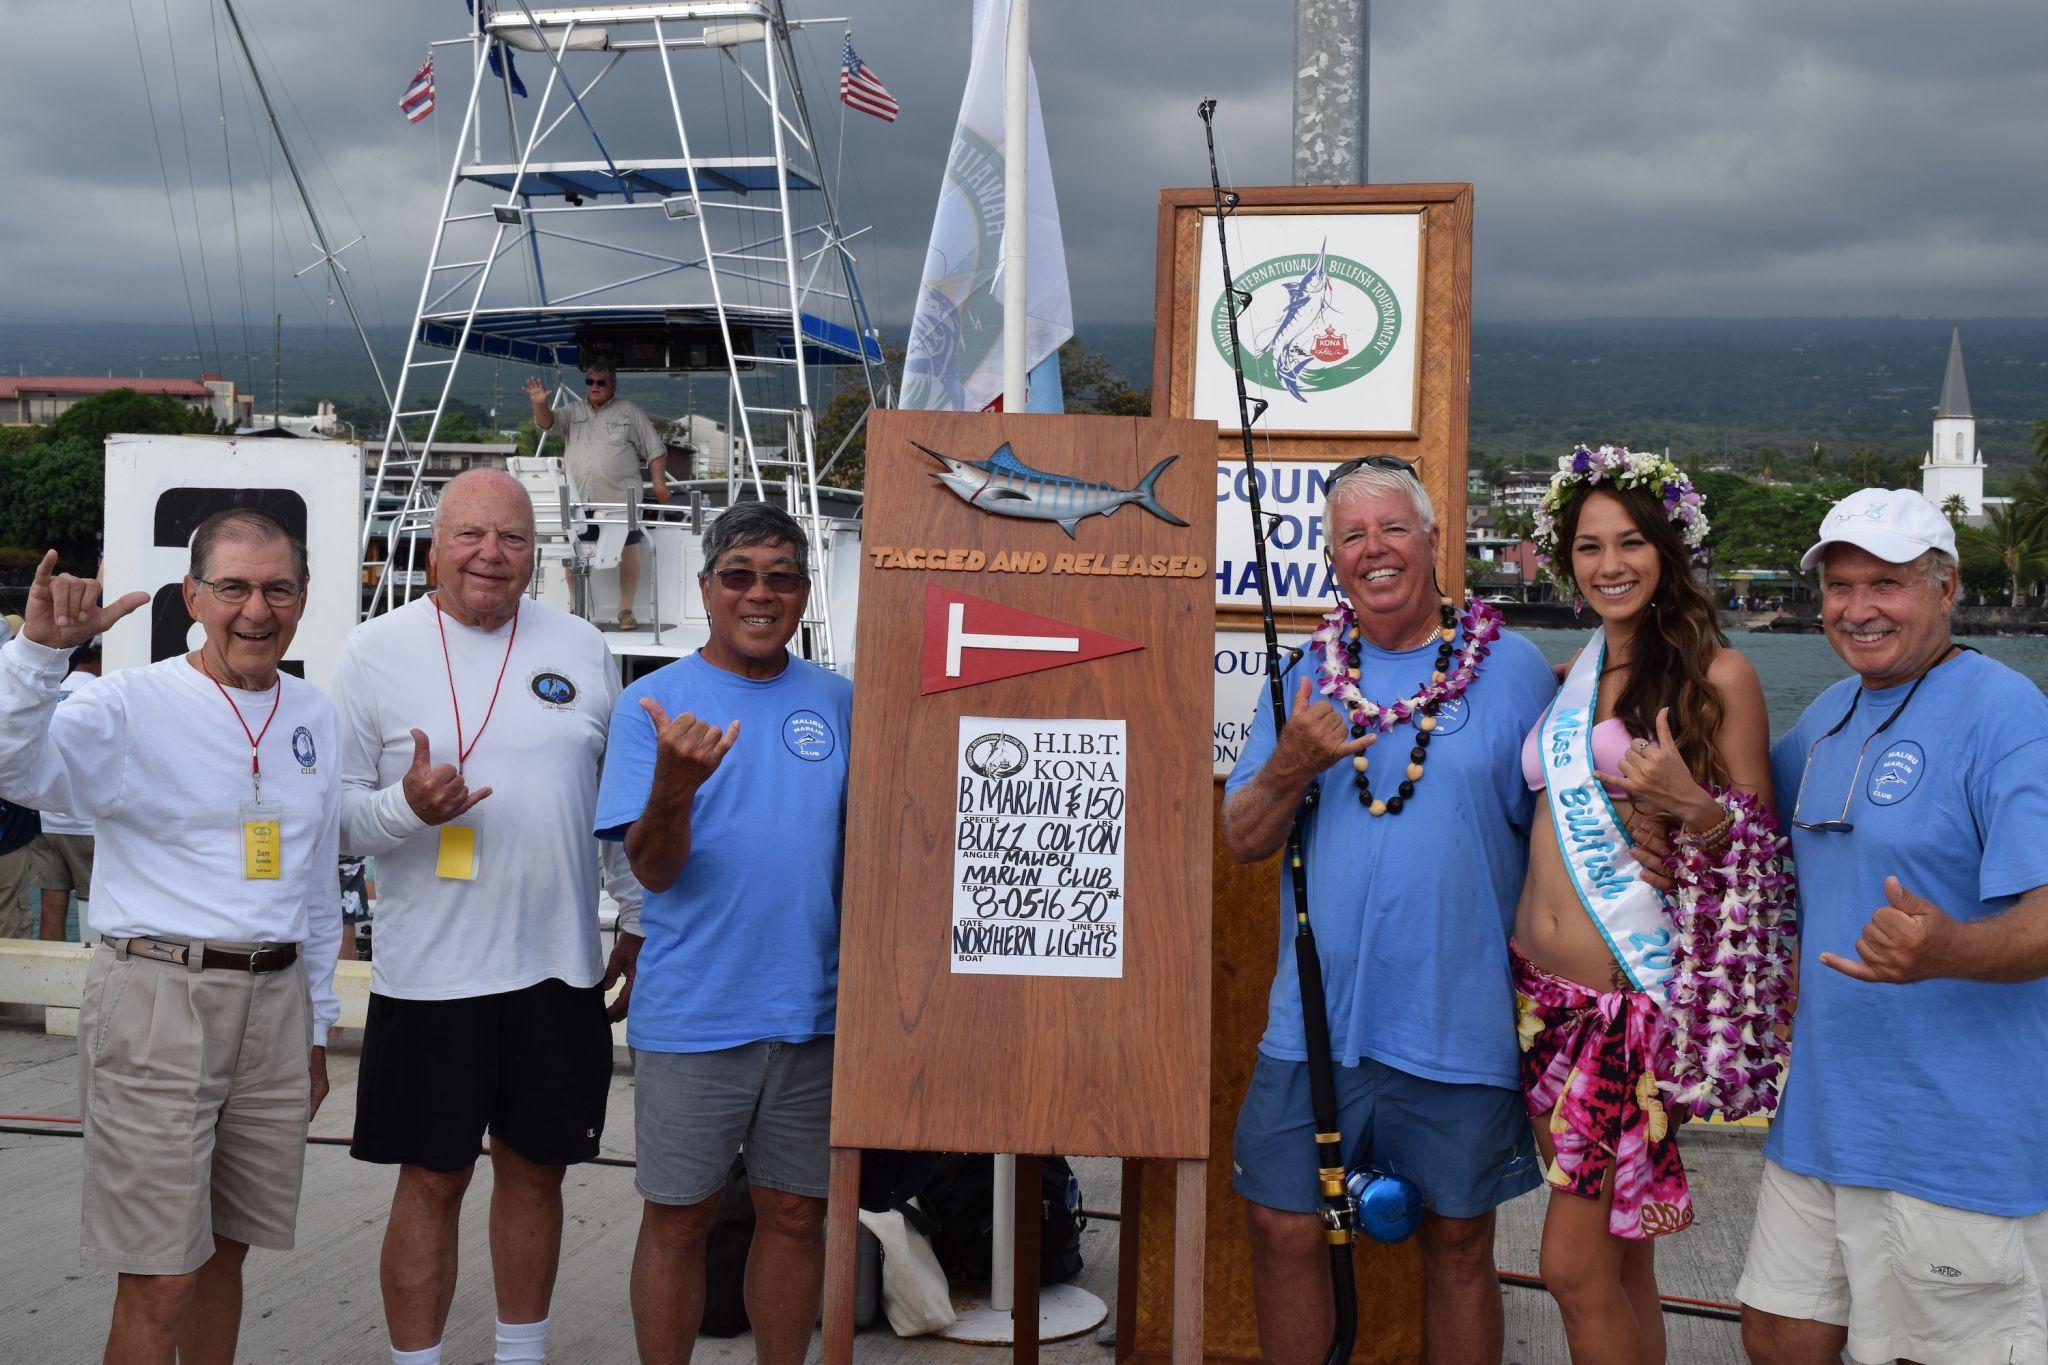 Malibu Marlin Club Wins HIBT